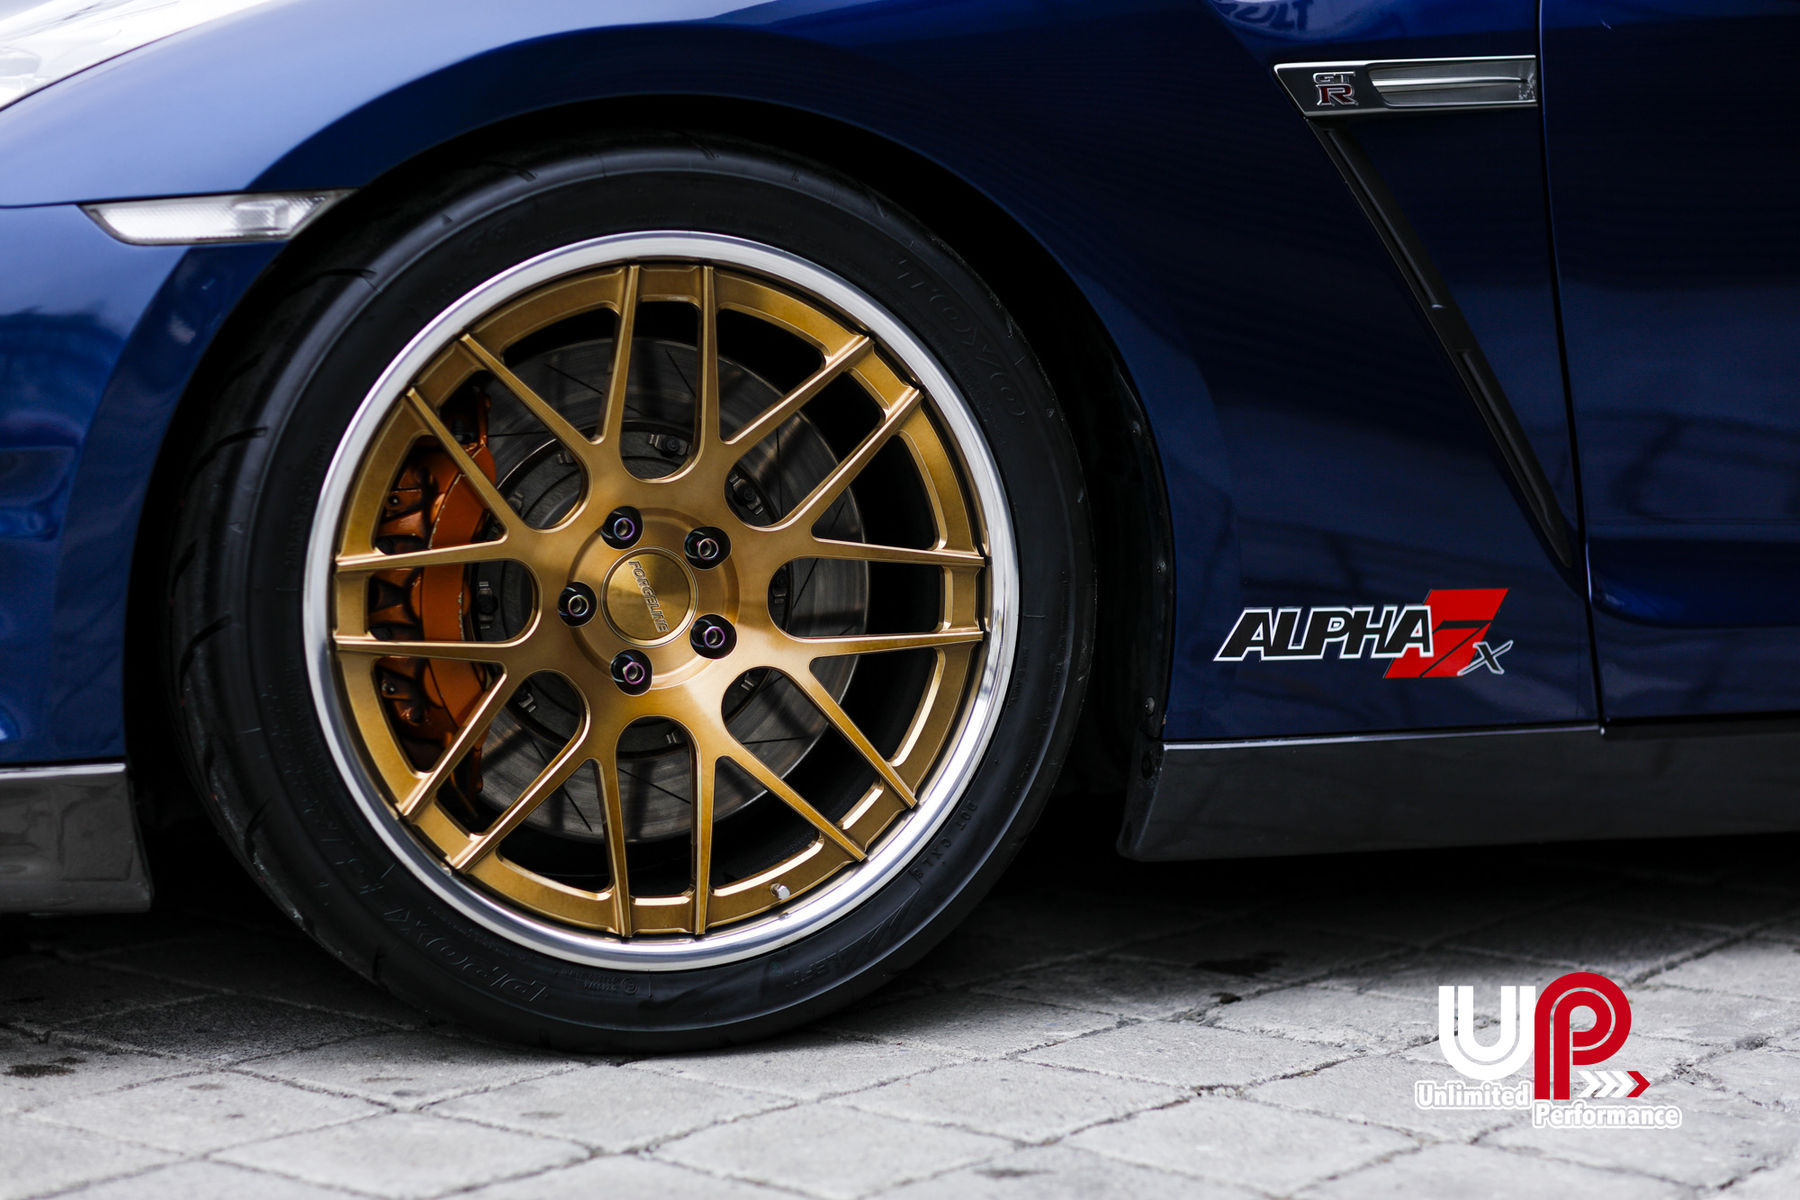 2015 Nissan GT-R | AMS Alpha 7-Powered R35 Nissan GT-R on Forgeline DE3C Concave Wheels